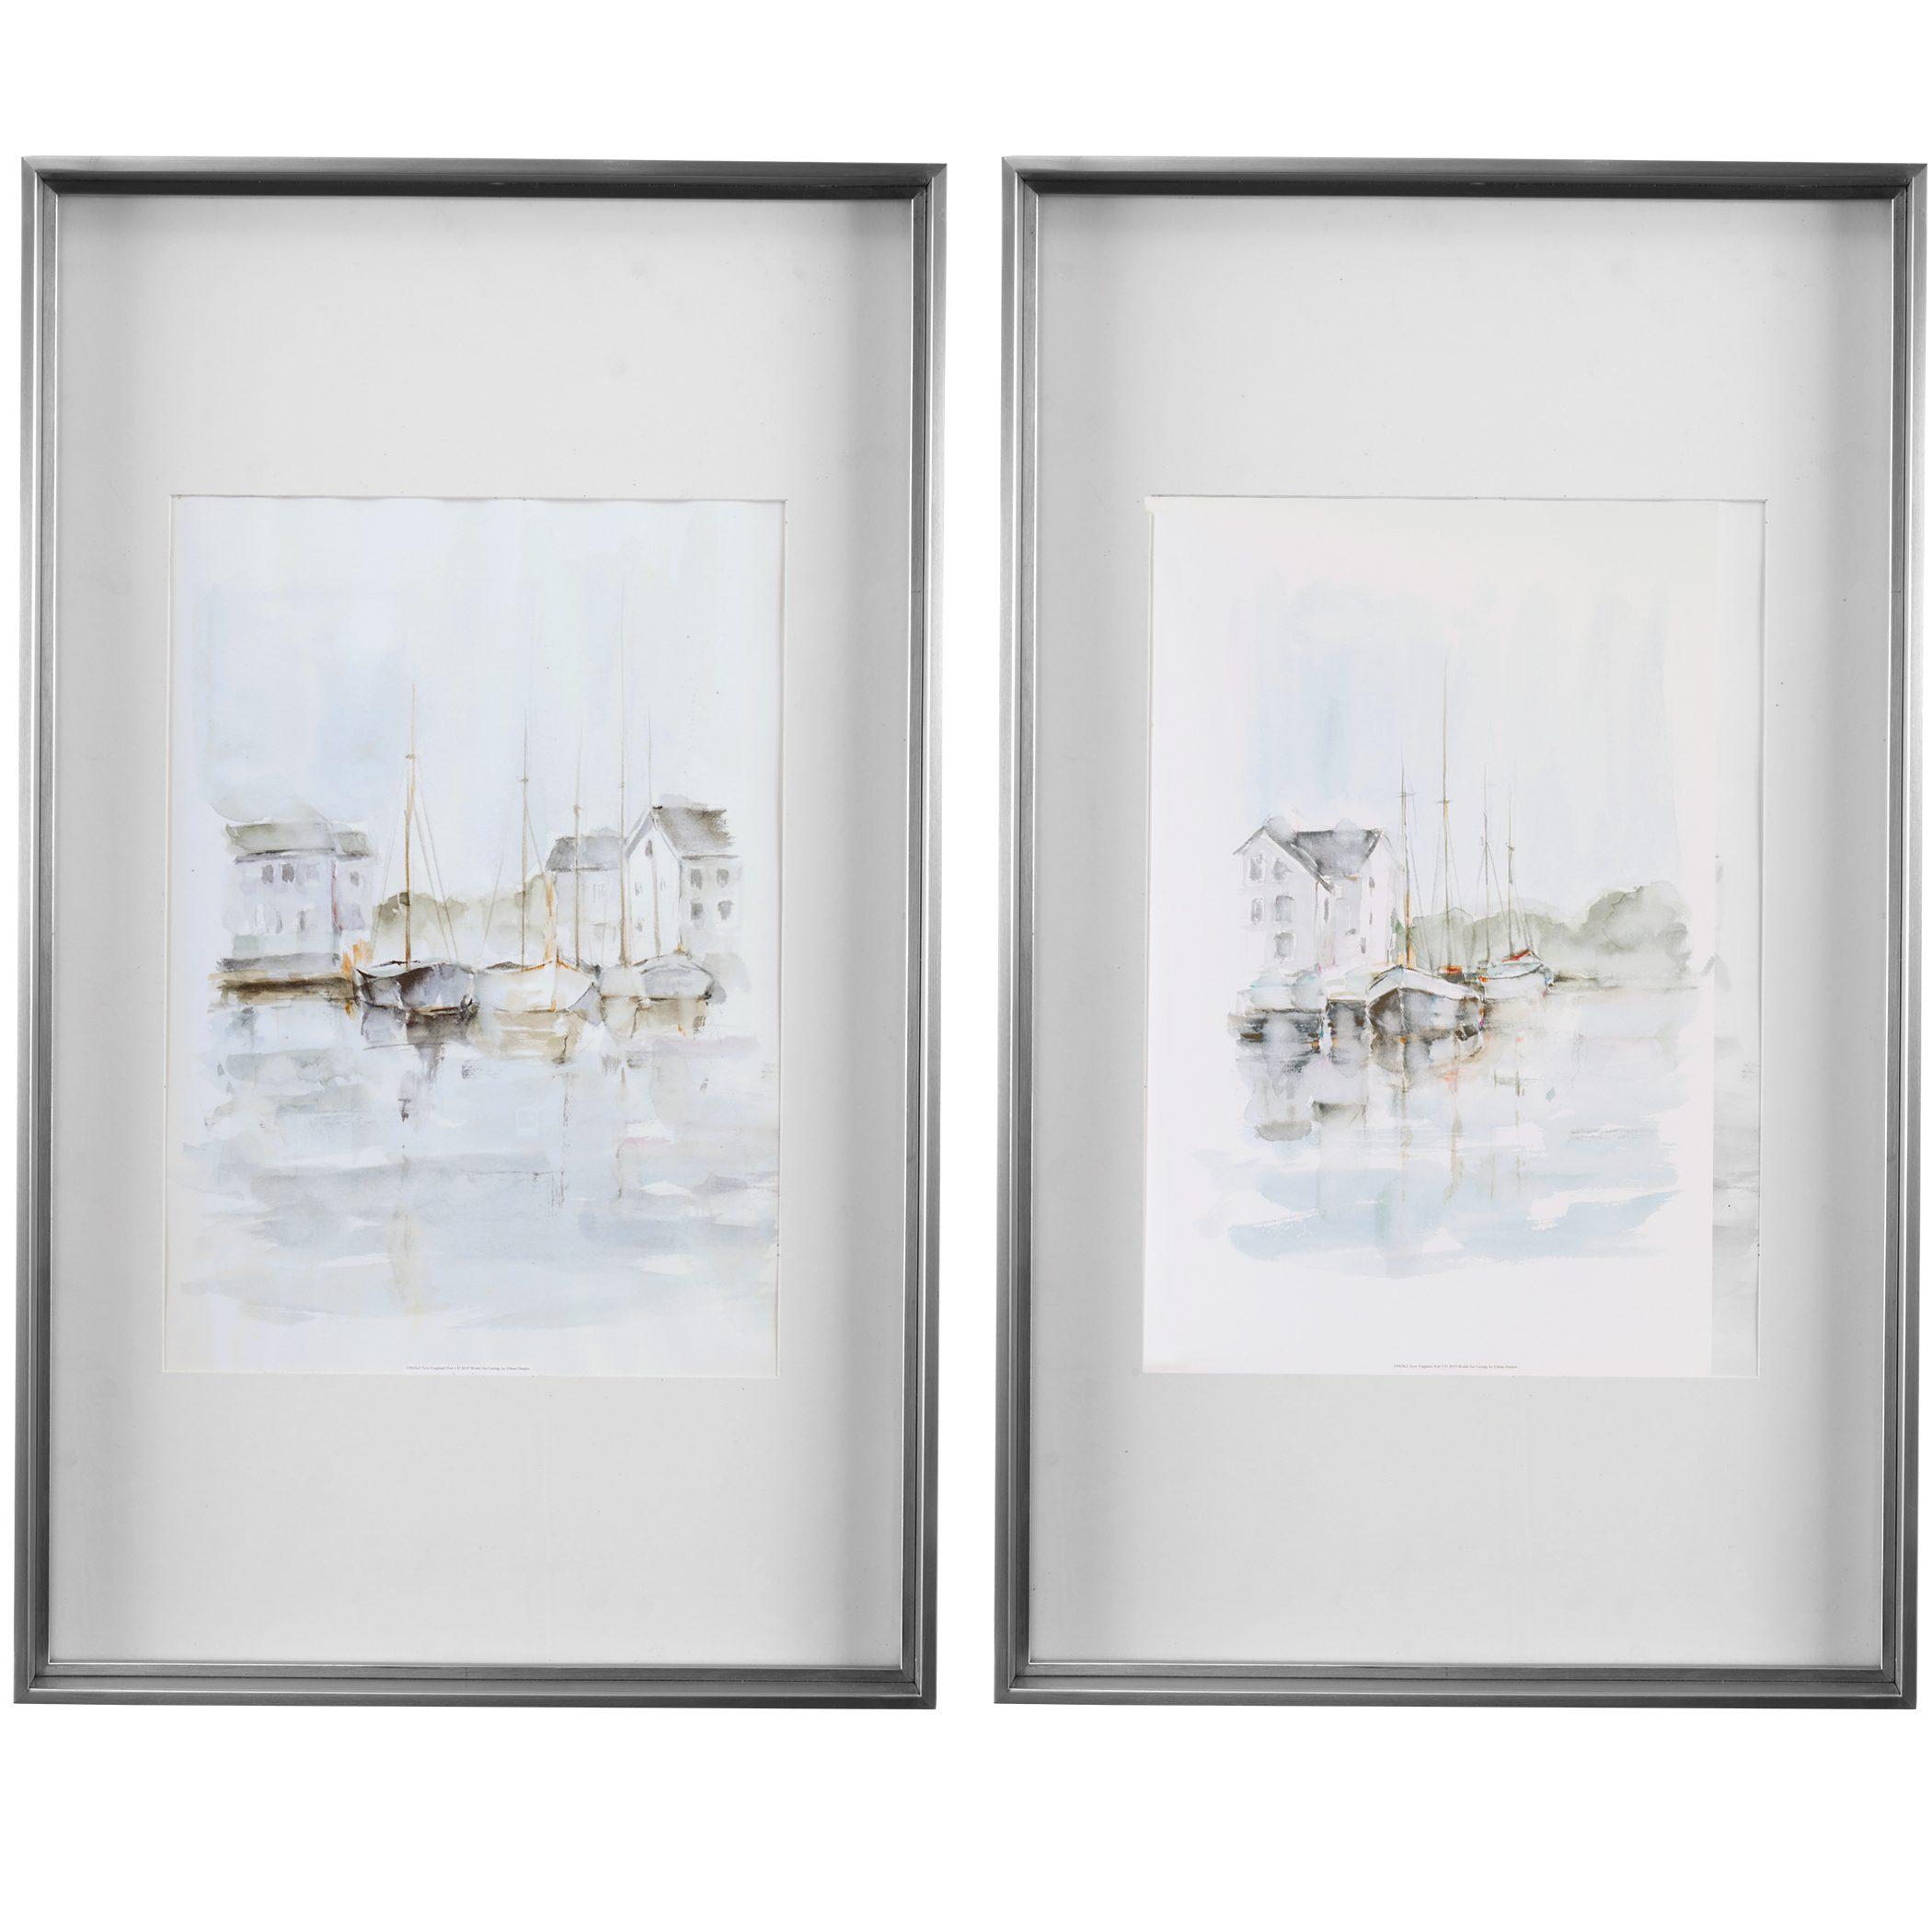 Uttermost New England Port Framed Prints, S/2